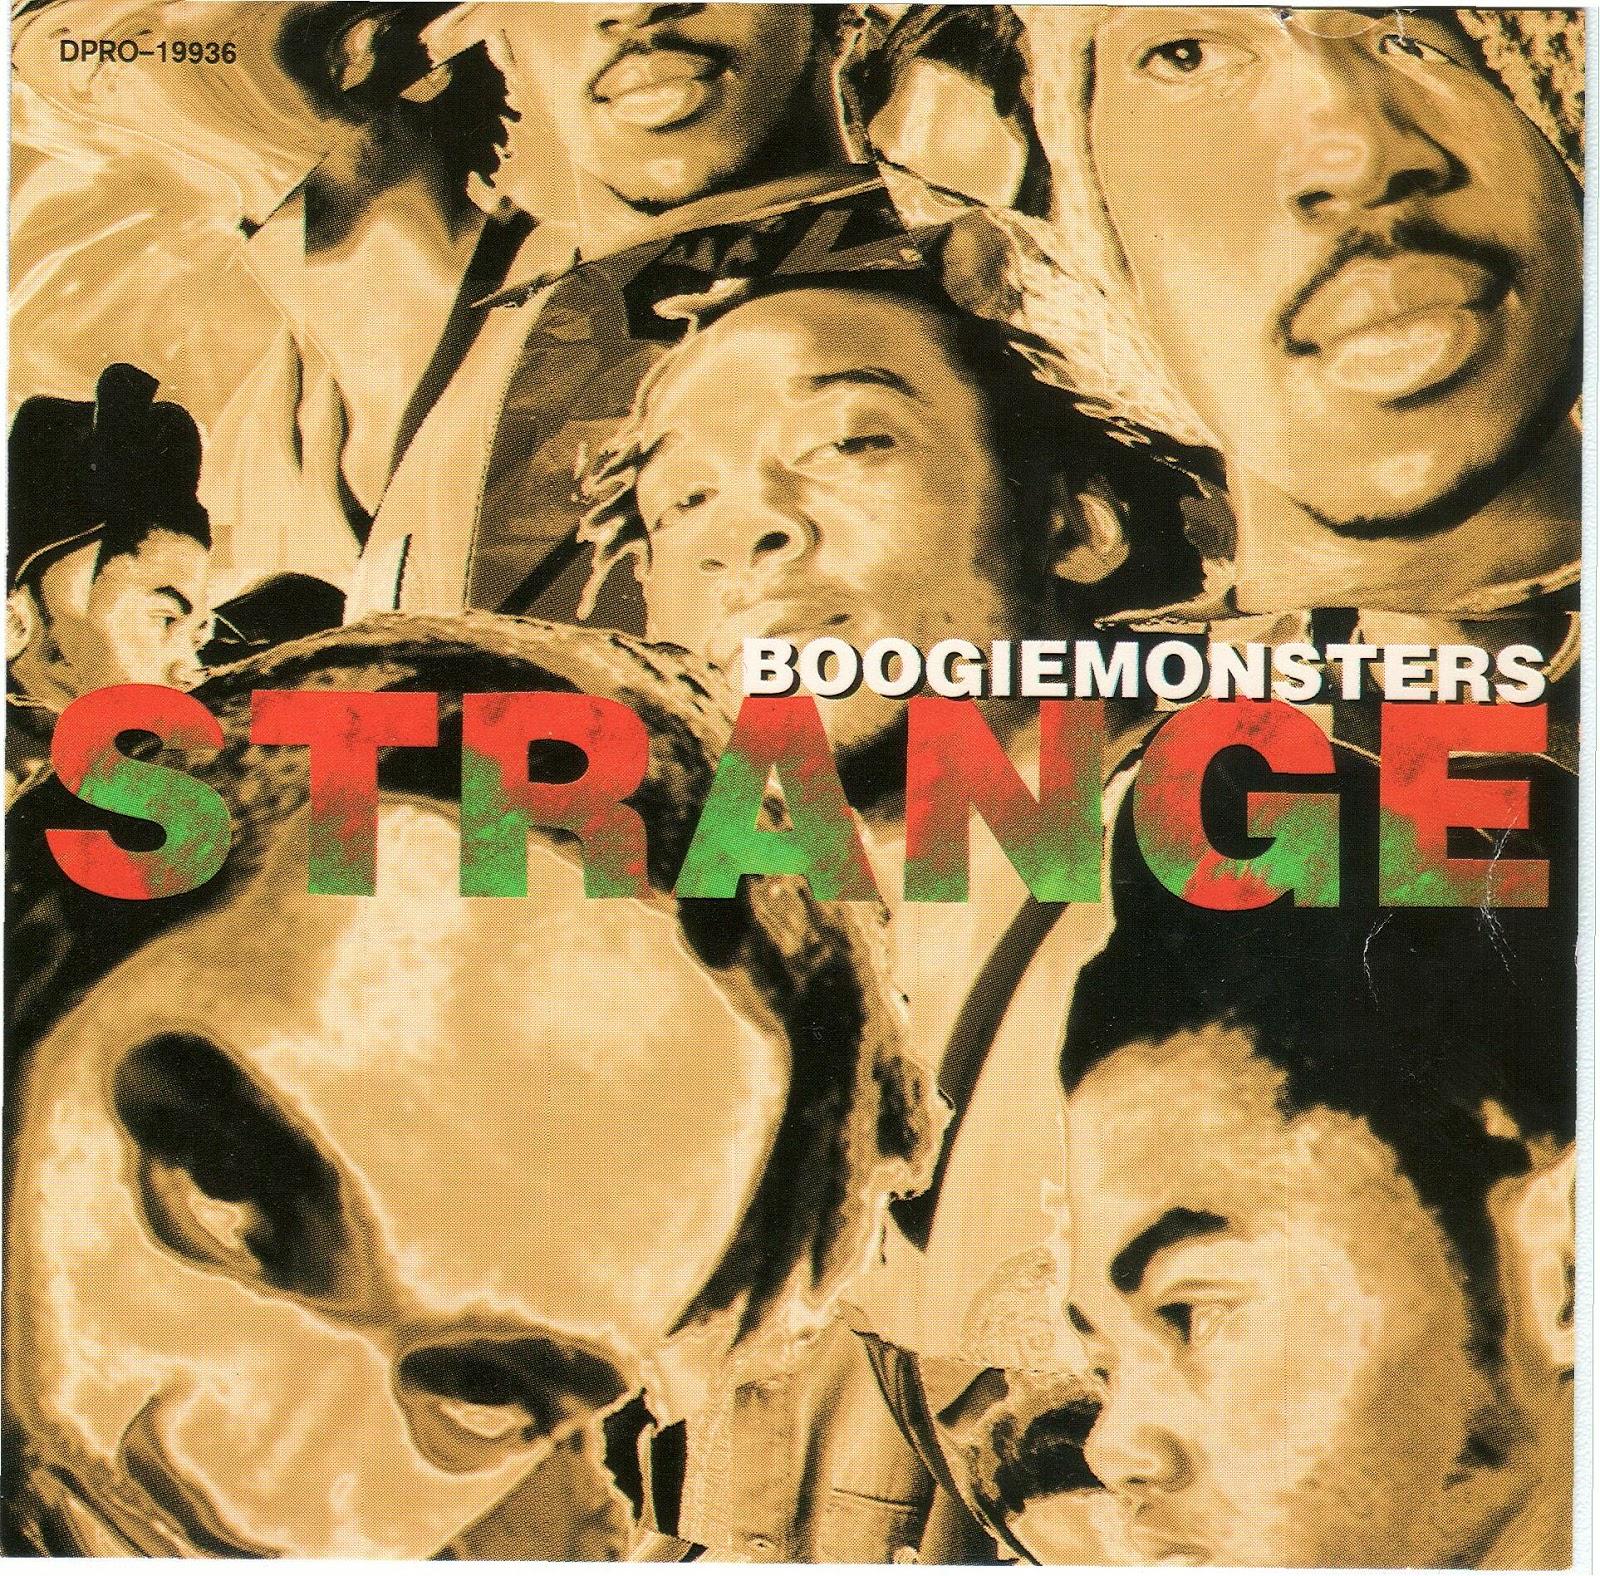 Boogiemonsters – Strange (CDS) (1994) (160 kbps)